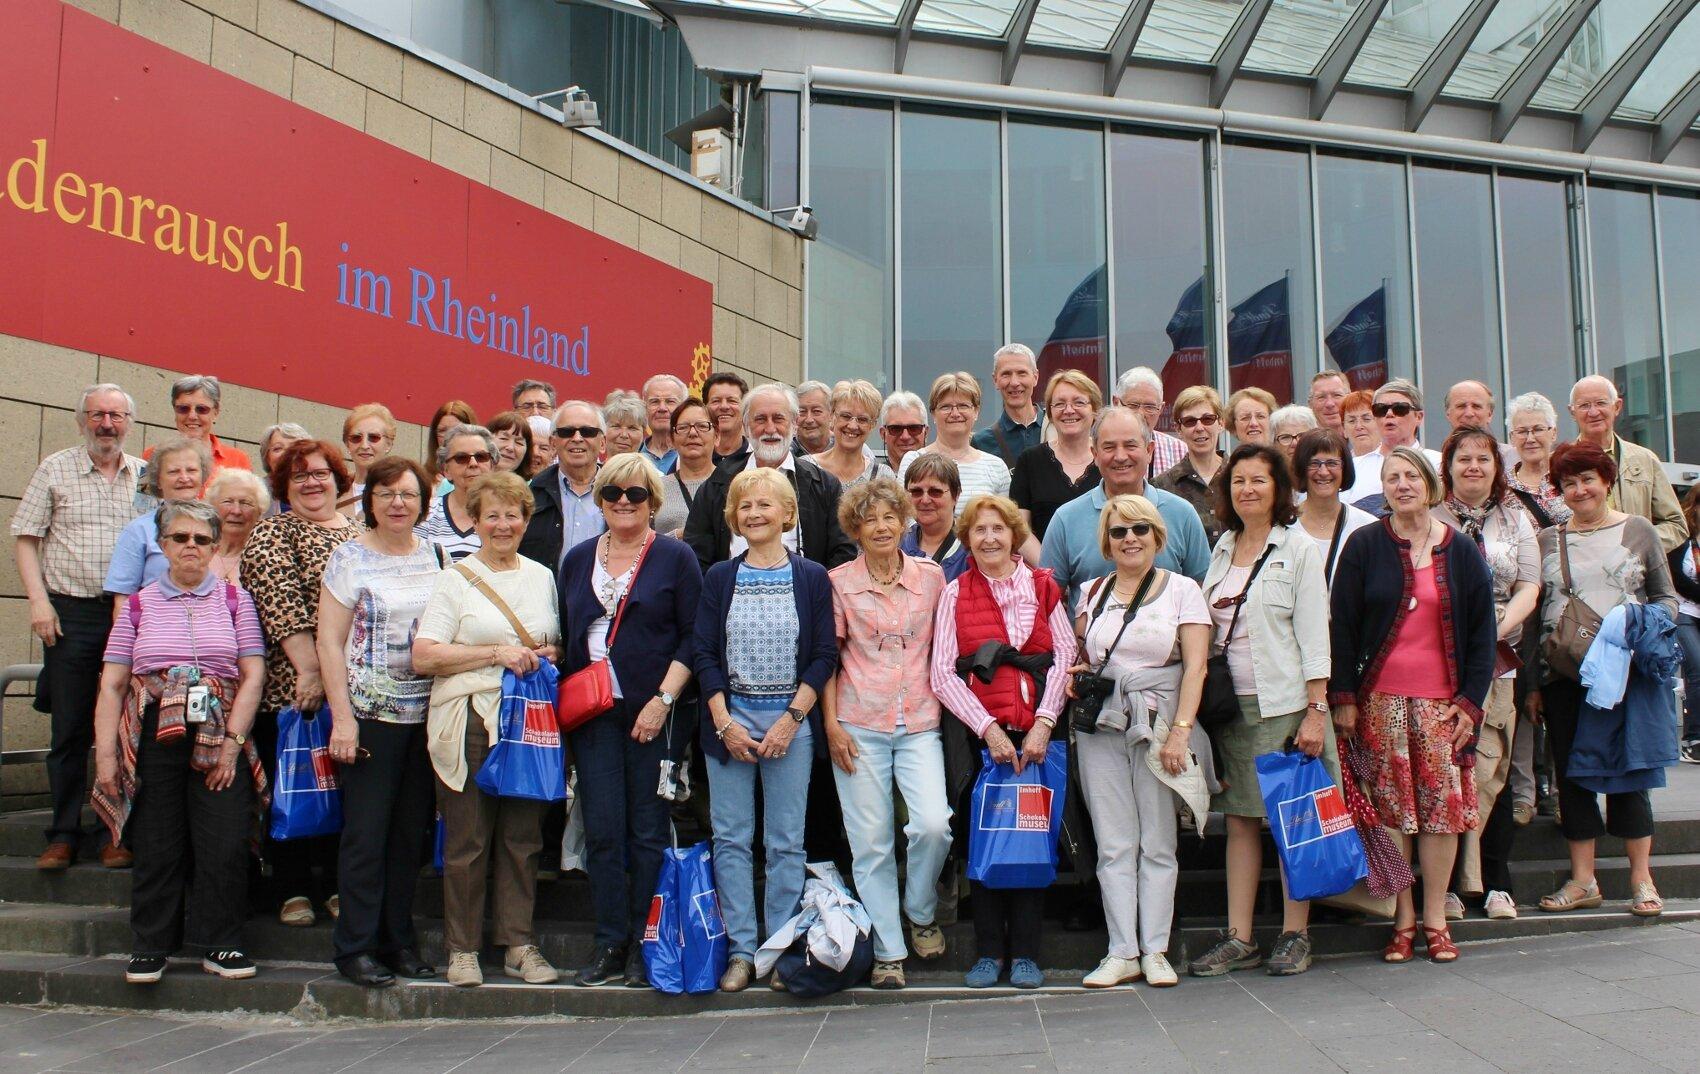 Cologne 11 juin 2016